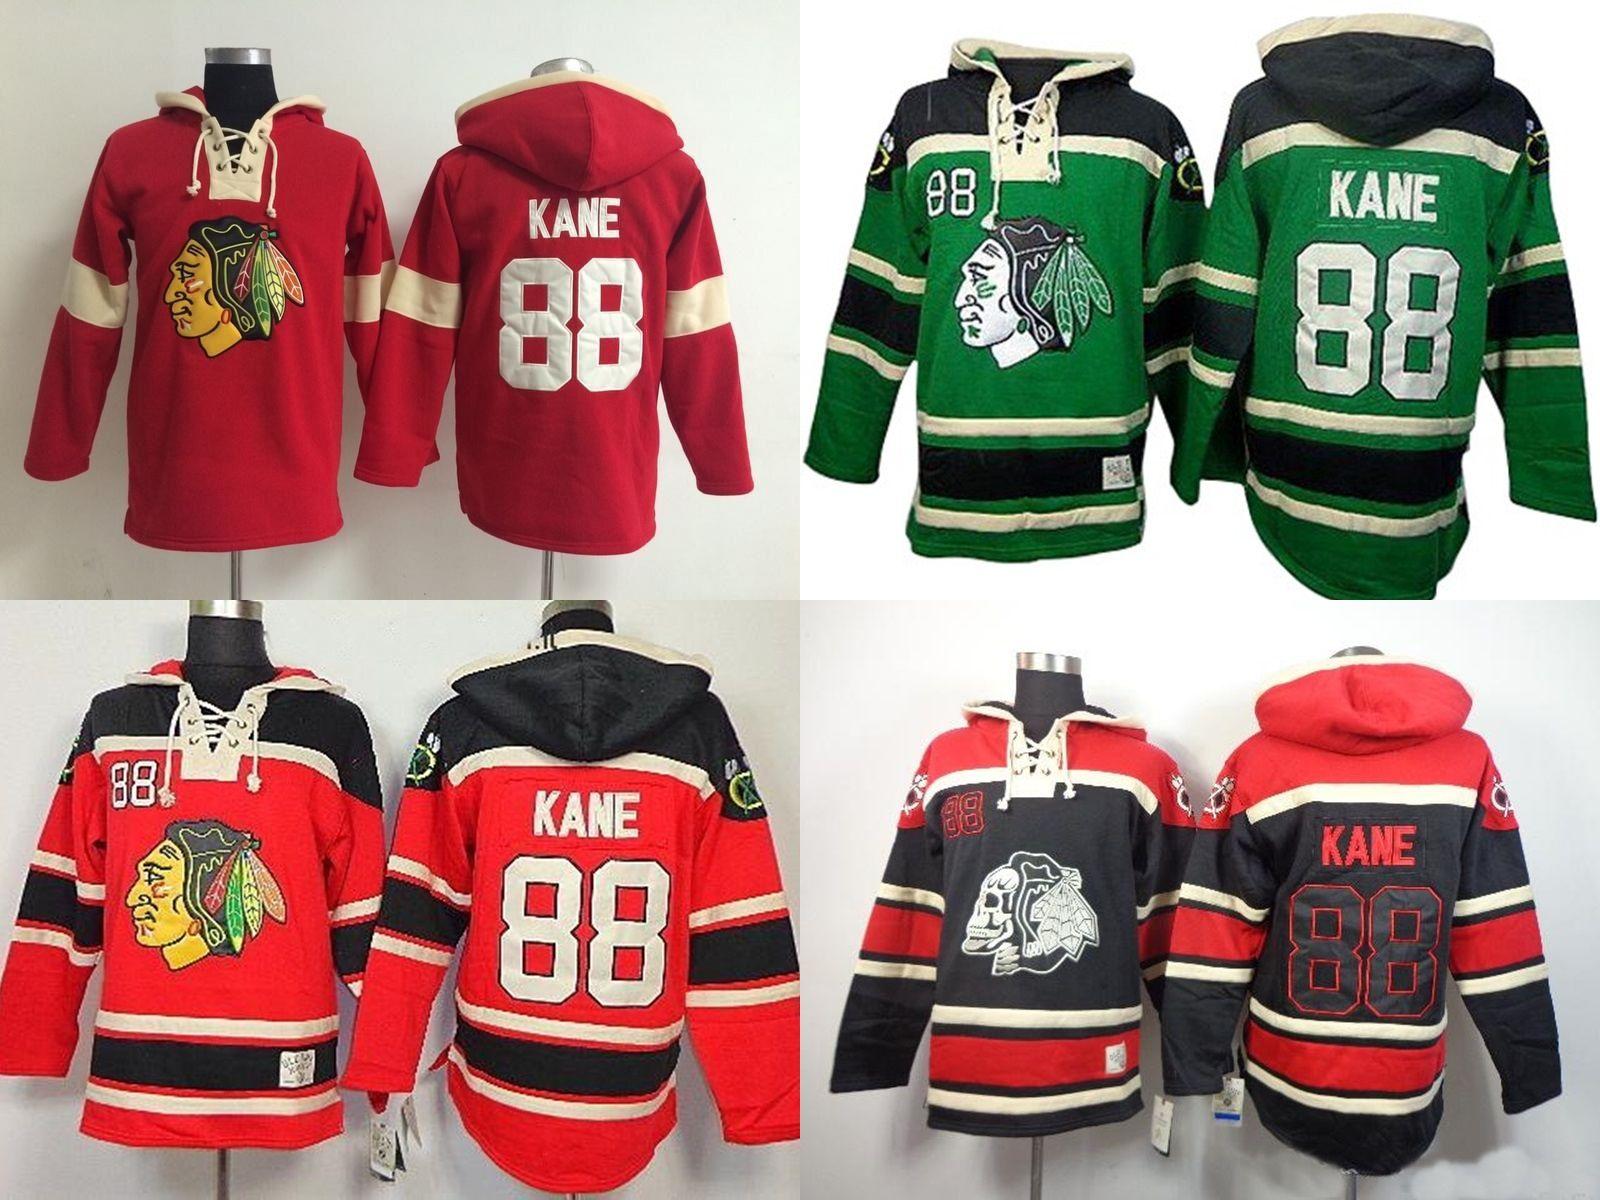 45240b6e7 Chicago Blackhawks Lace Jersey Team Hoodie Sweatshirt - BCD Tofu House